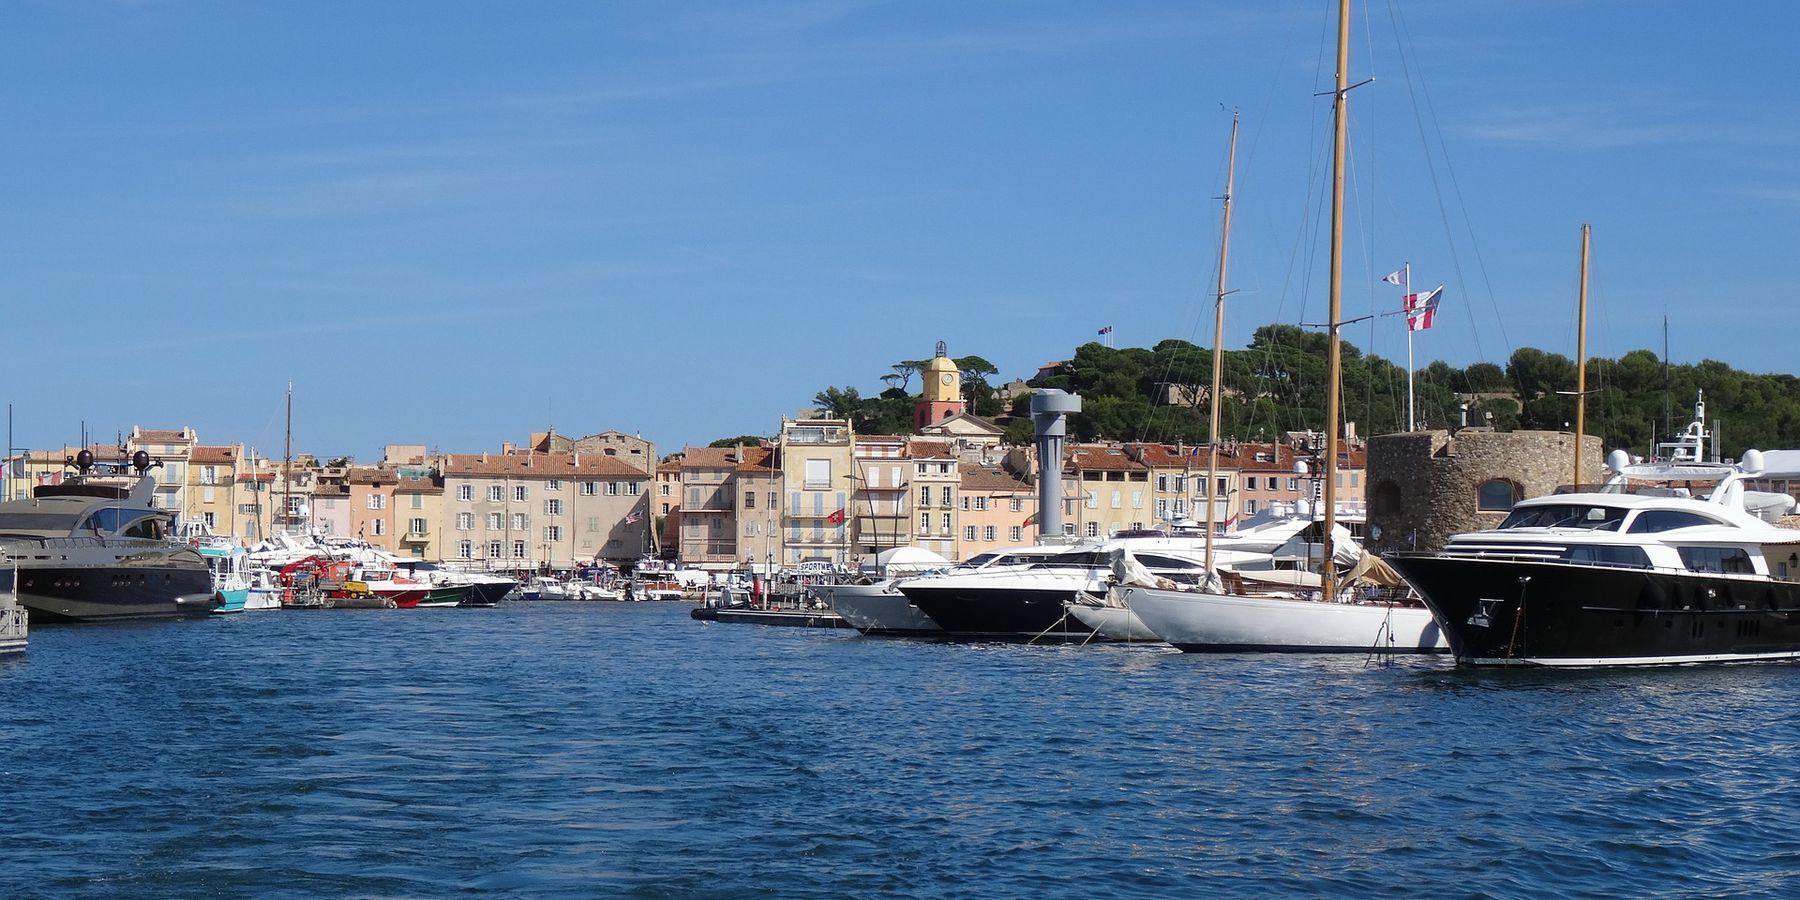 Jachthaven Saint Tropez Doets Reizen abeelding van Emma Blowers via Pixabay   Frankrijk